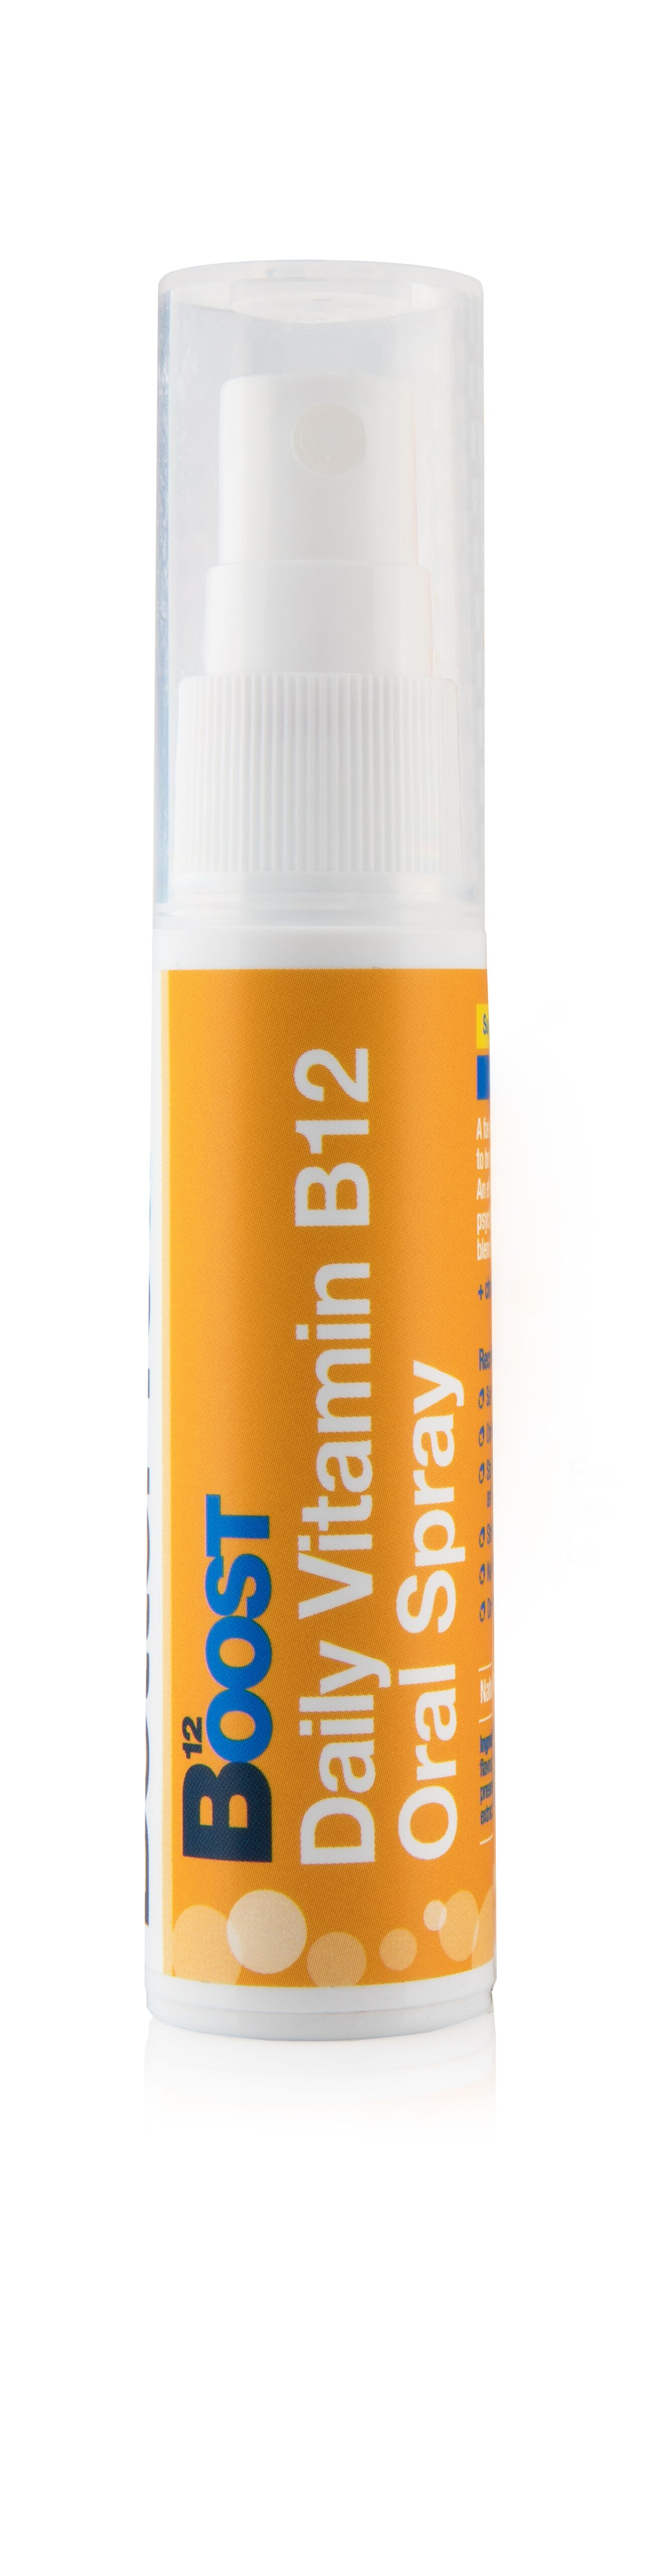 Daily Vitamin B12 Boost Oral Spray 25ml